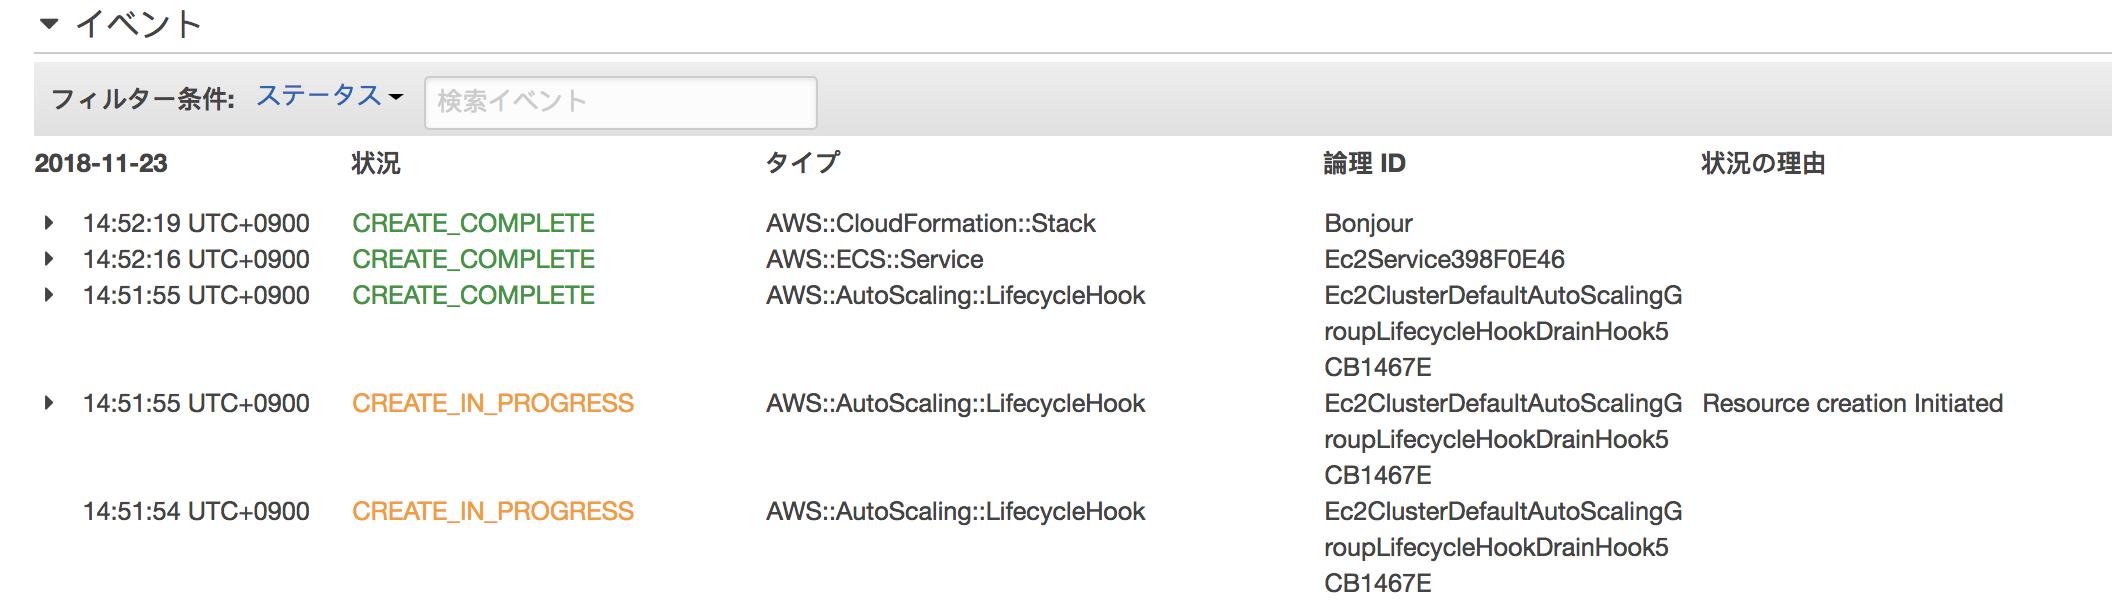 AWS Cloud Development Kitをためしてみる (Typescript) - Qiita